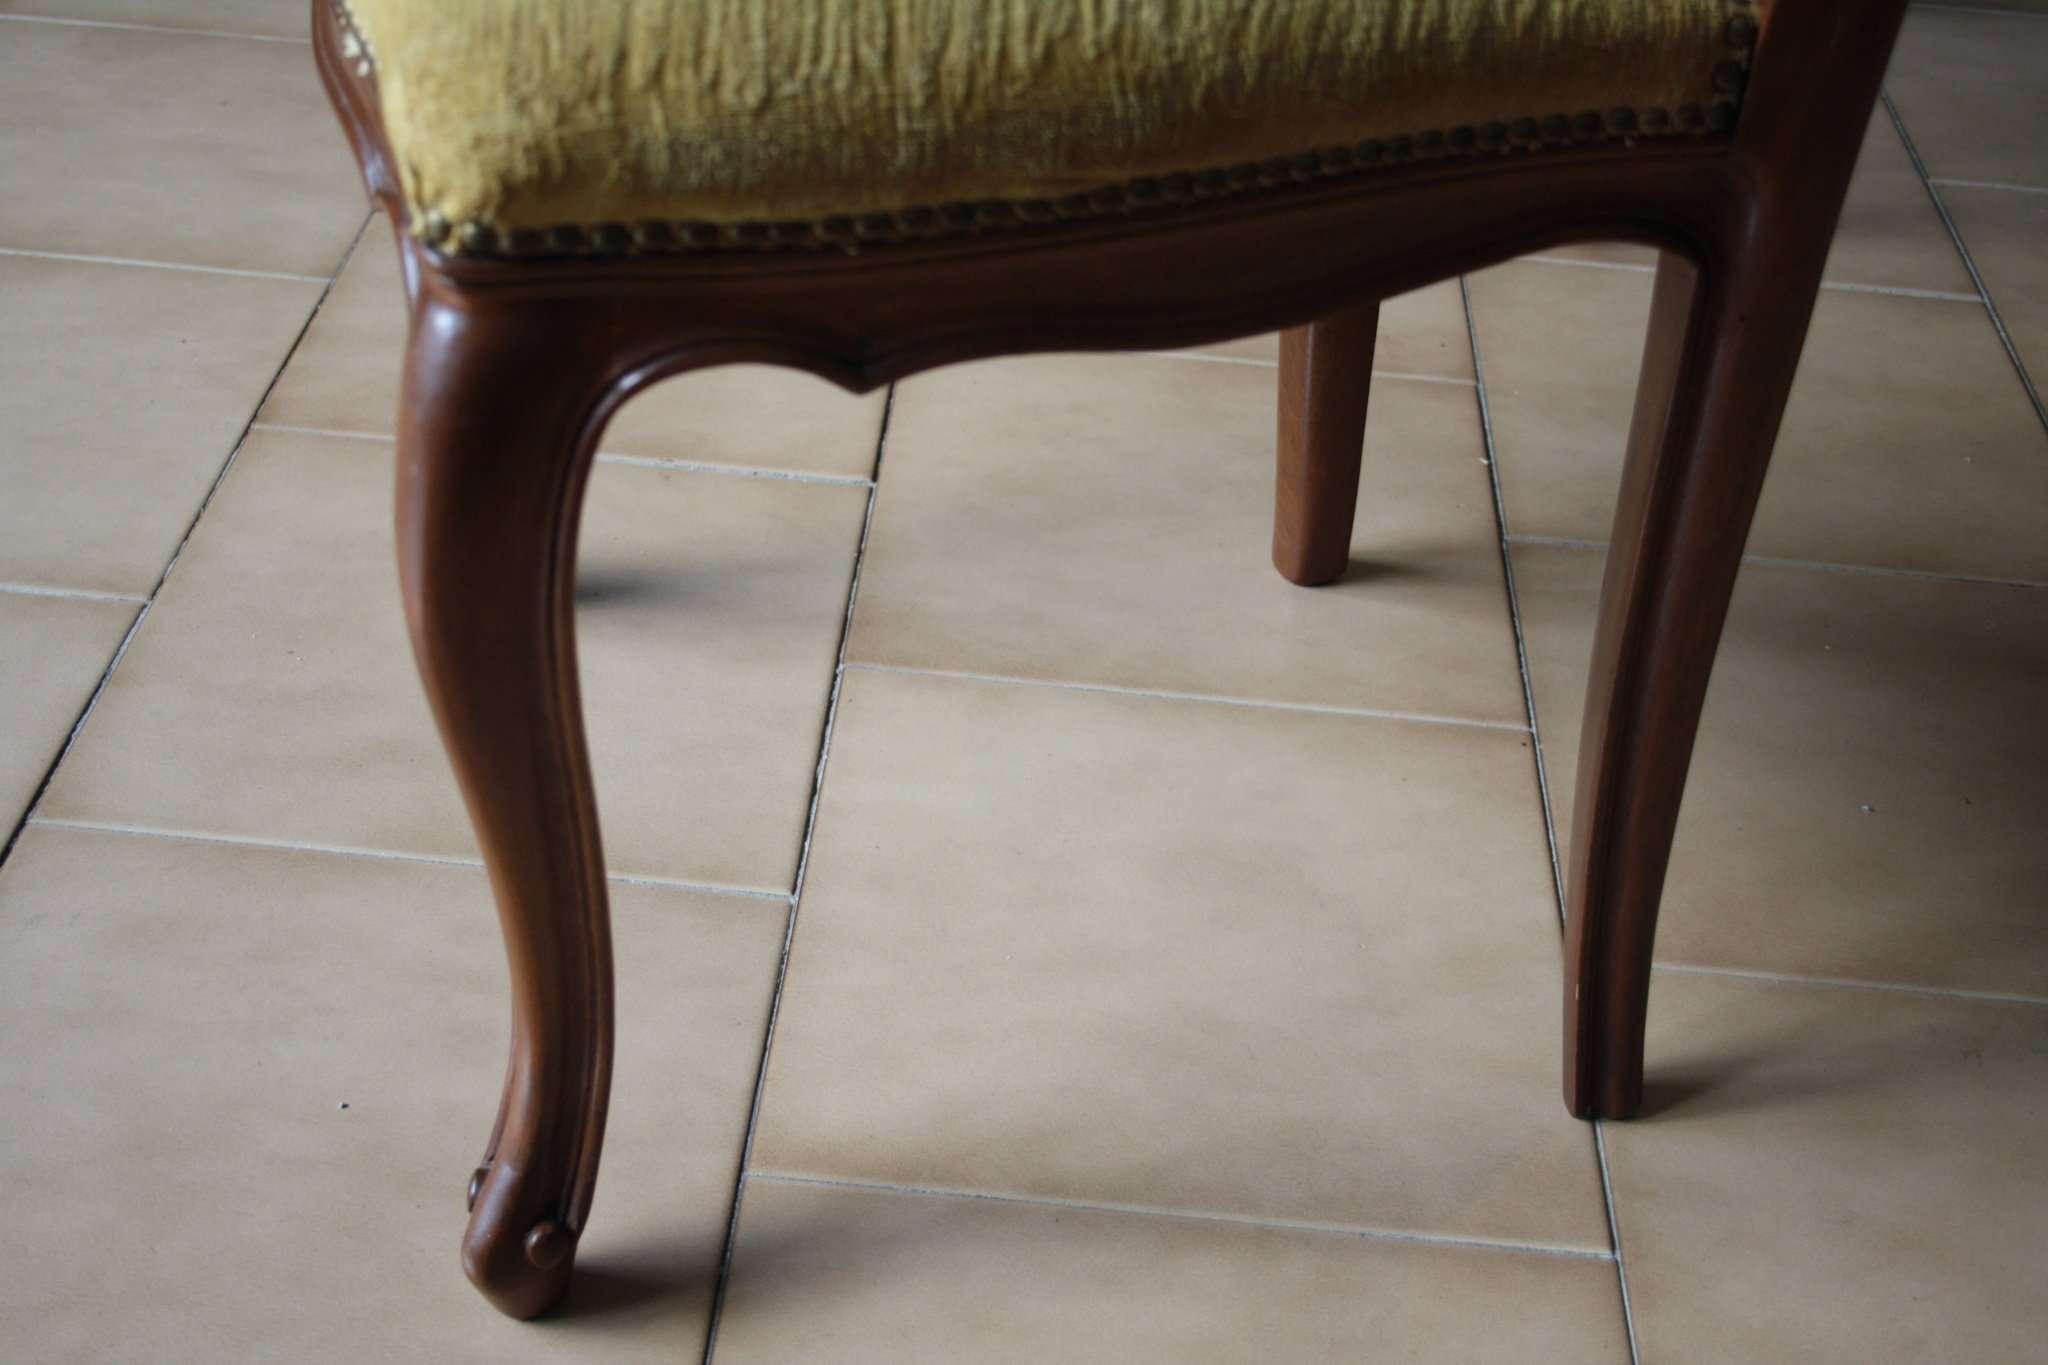 Six walnut wood chairs